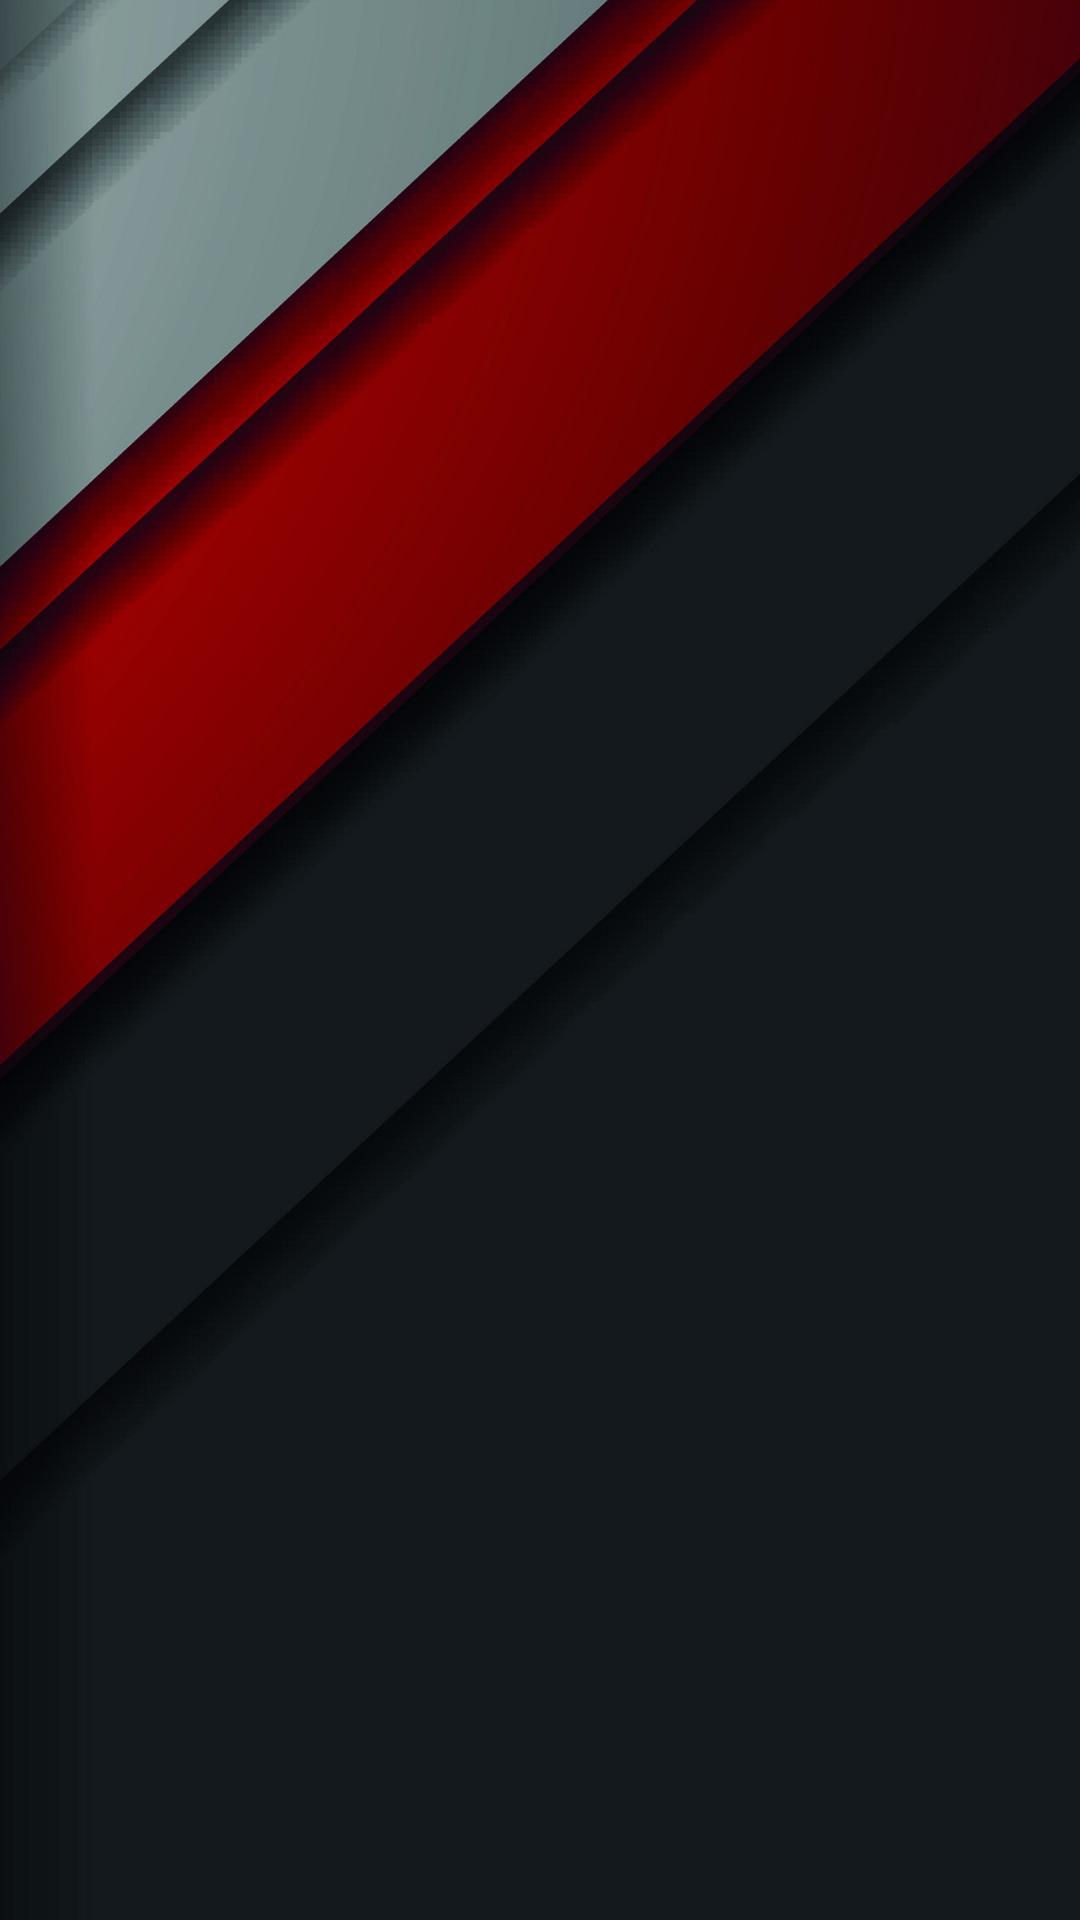 Design   iPhone 6 Plus best wallpapers 1080x1920